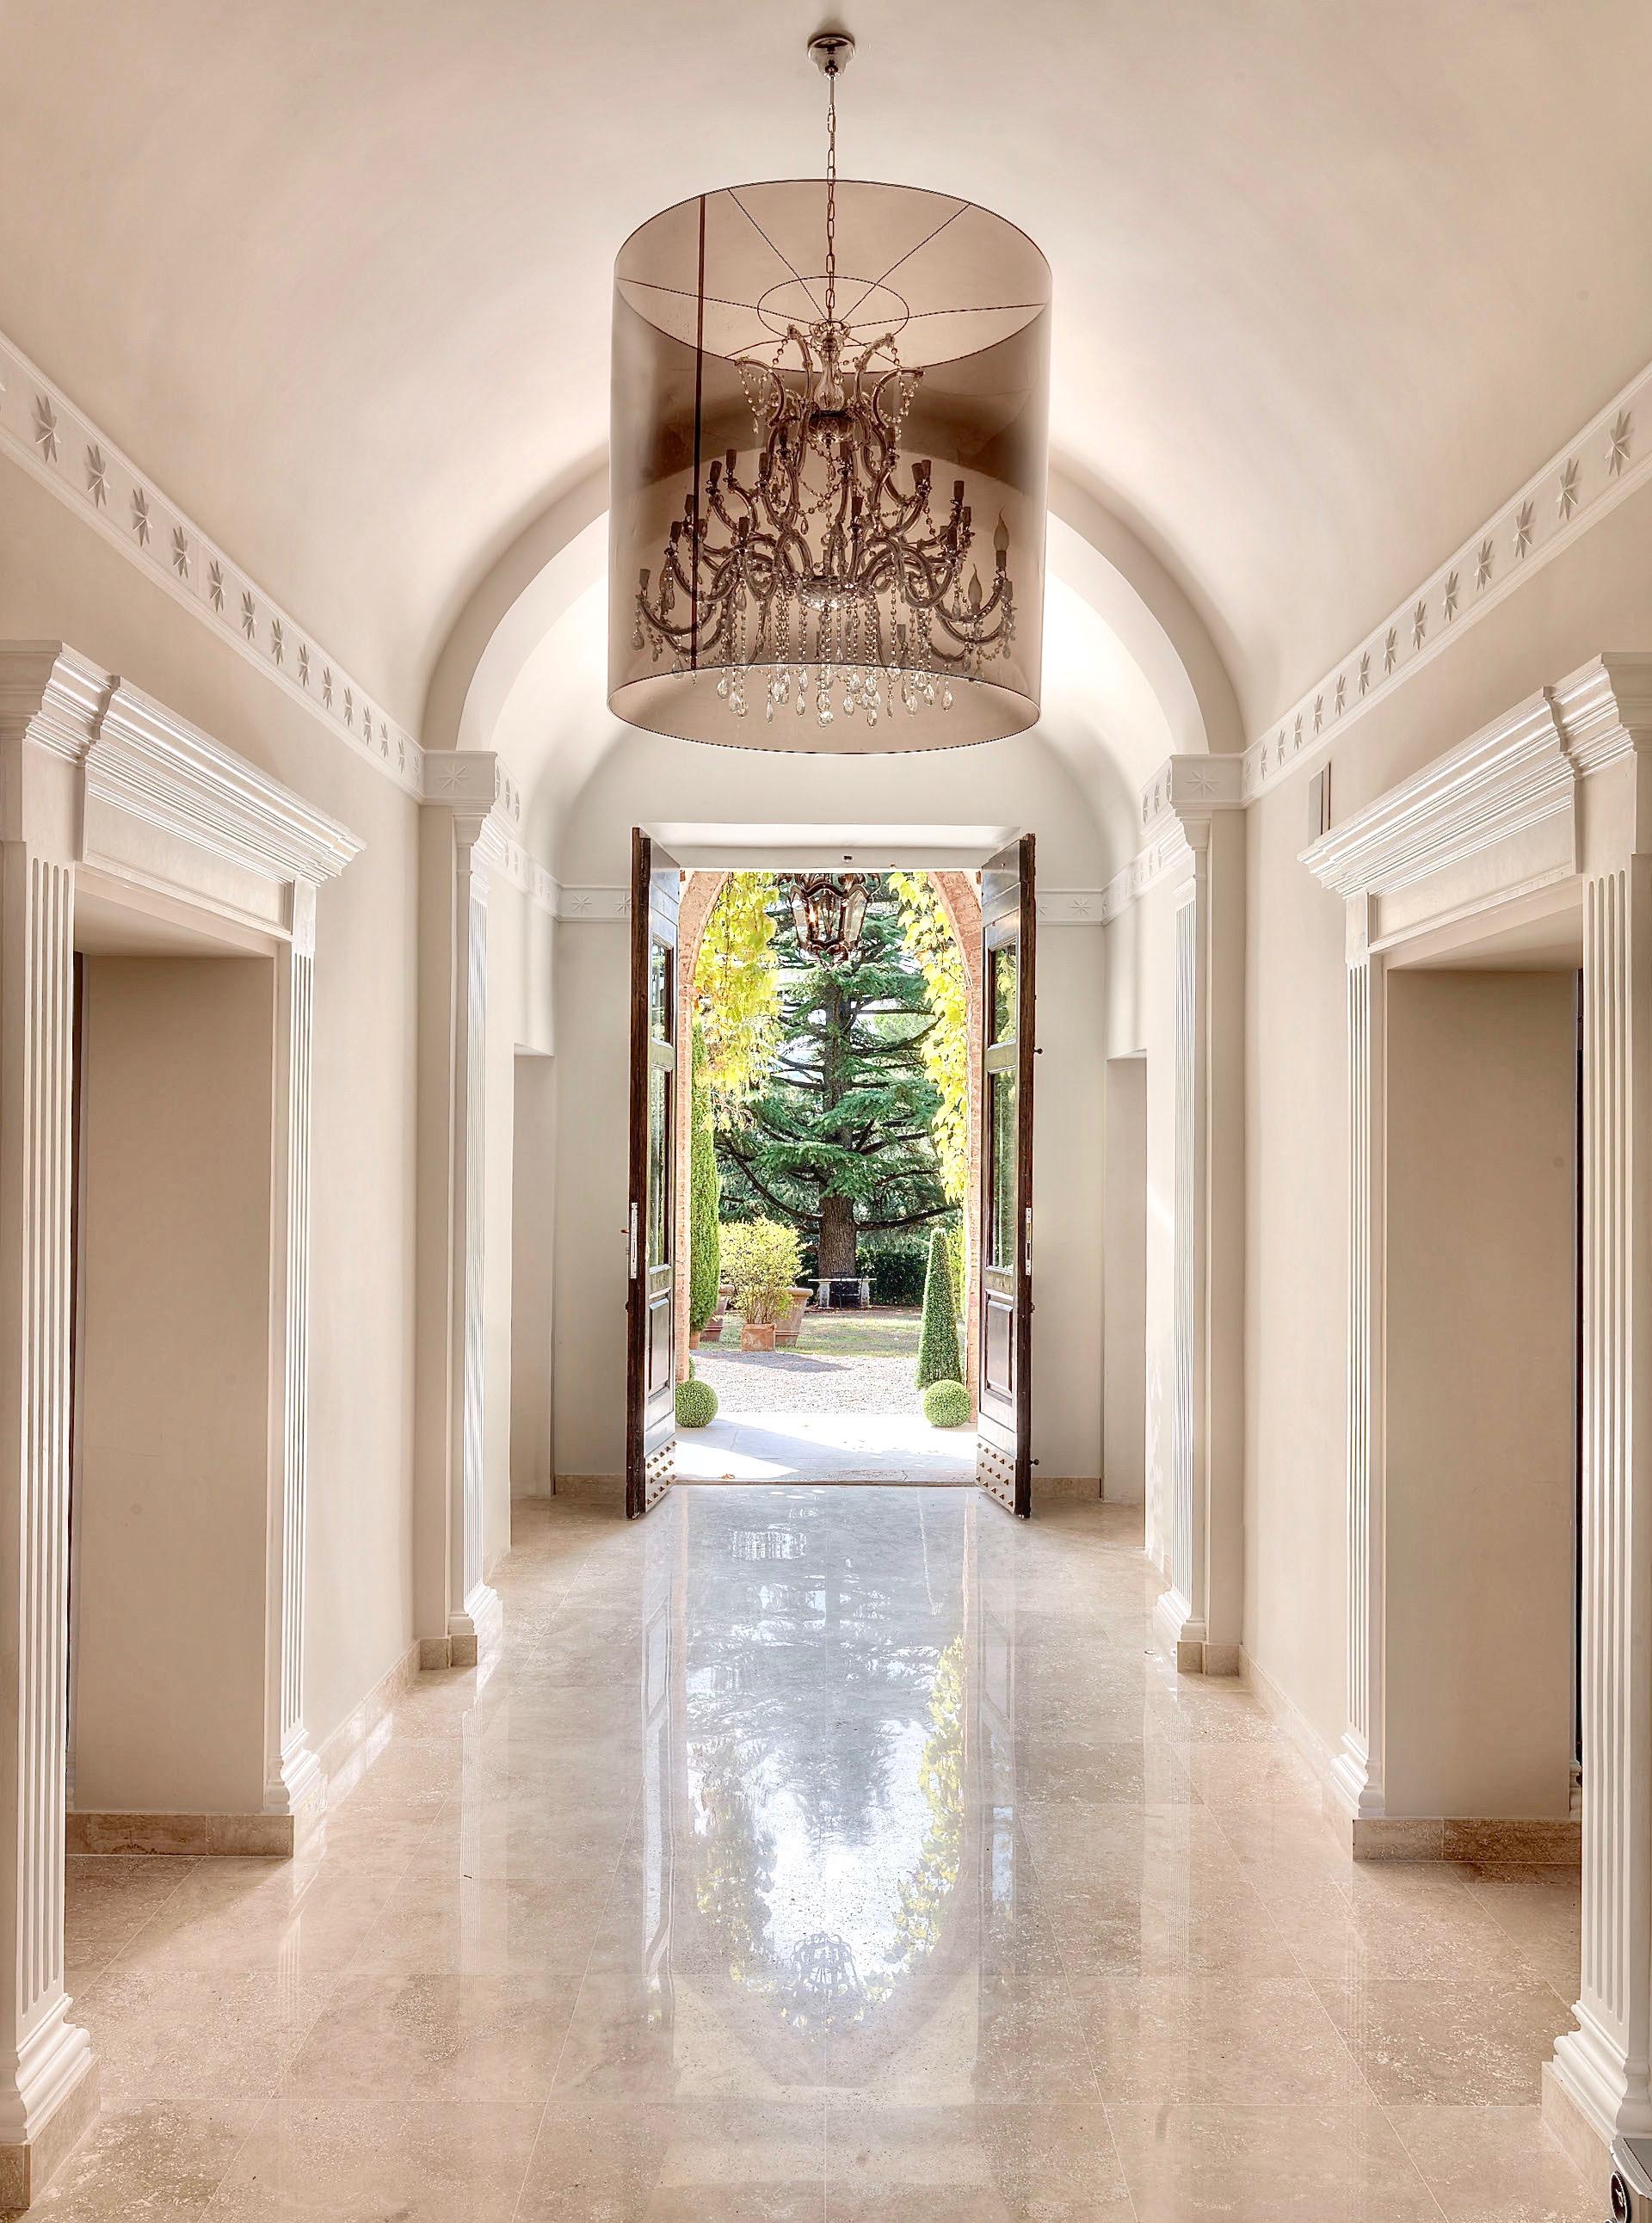 Interior Corridor 01